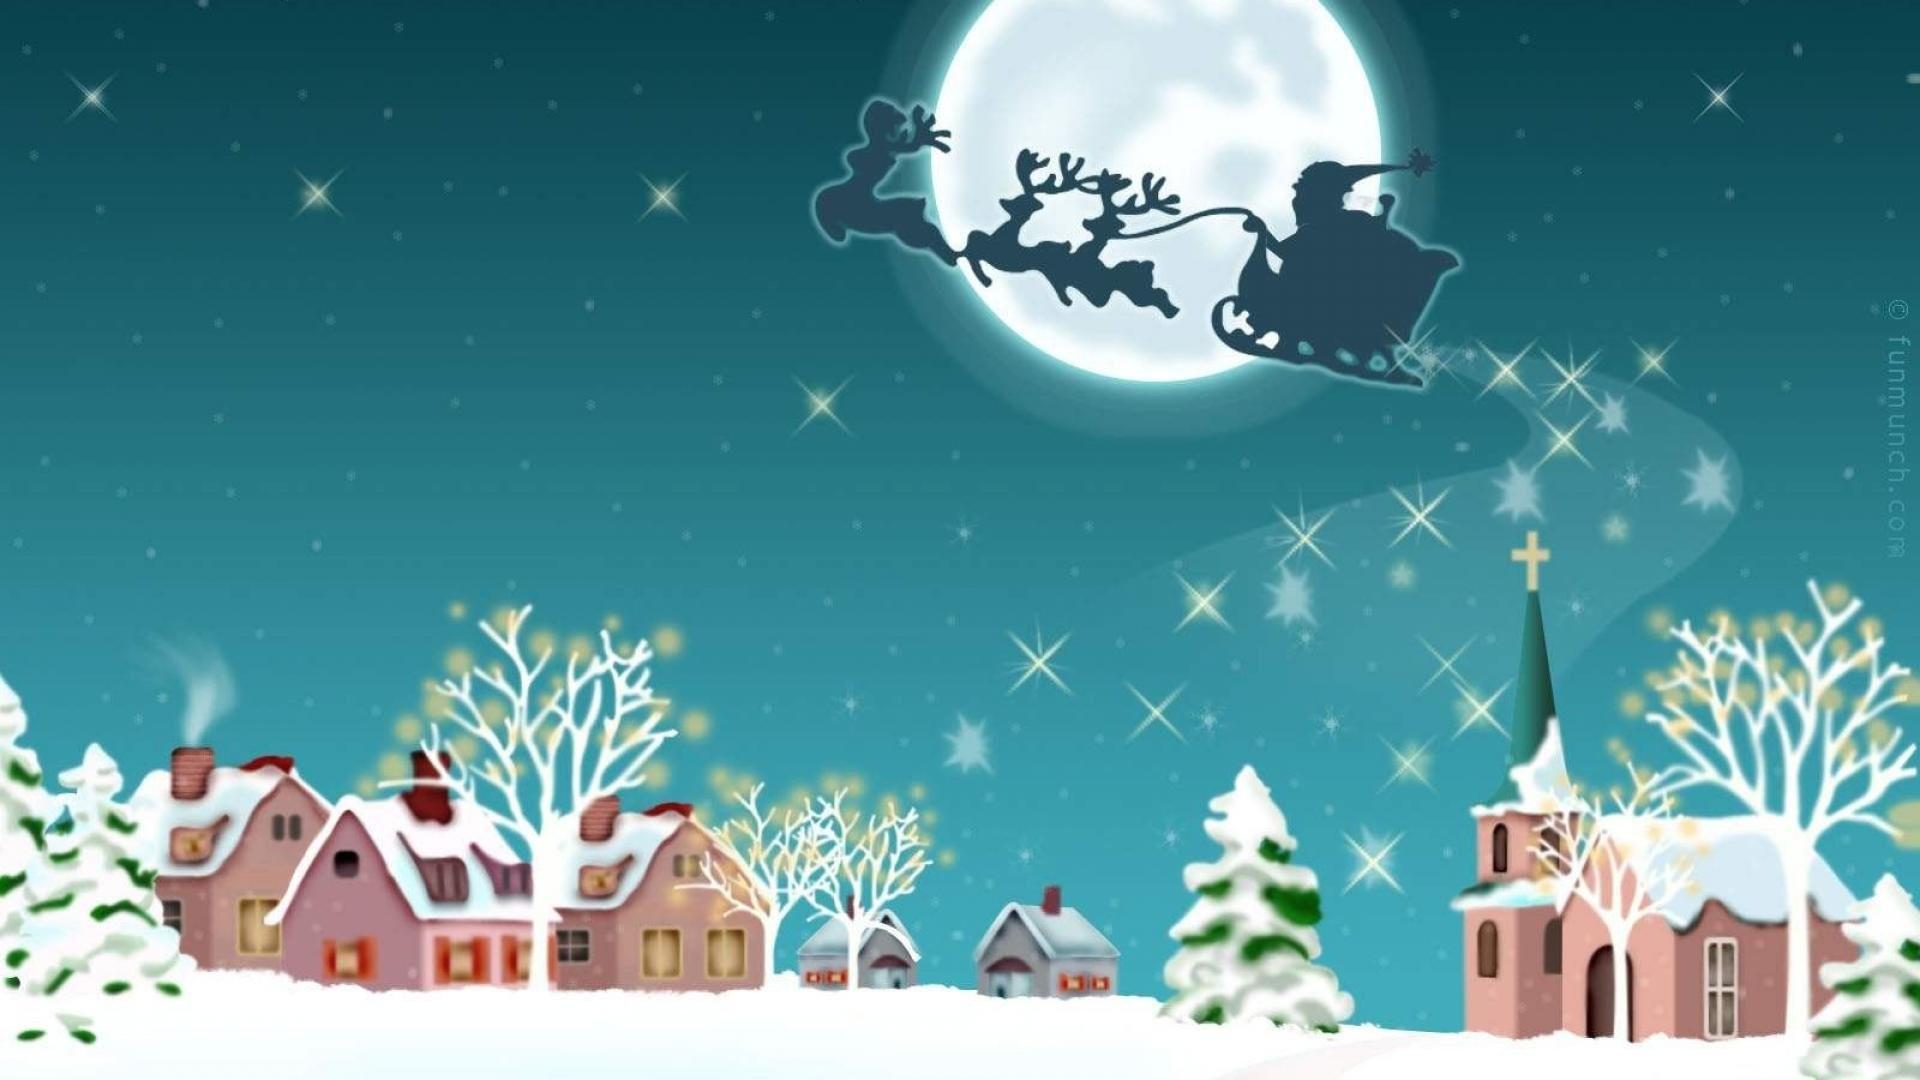 Free Ipad Wallpaper Christmas: Vintage Christmas Background ·① Download Free Stunning